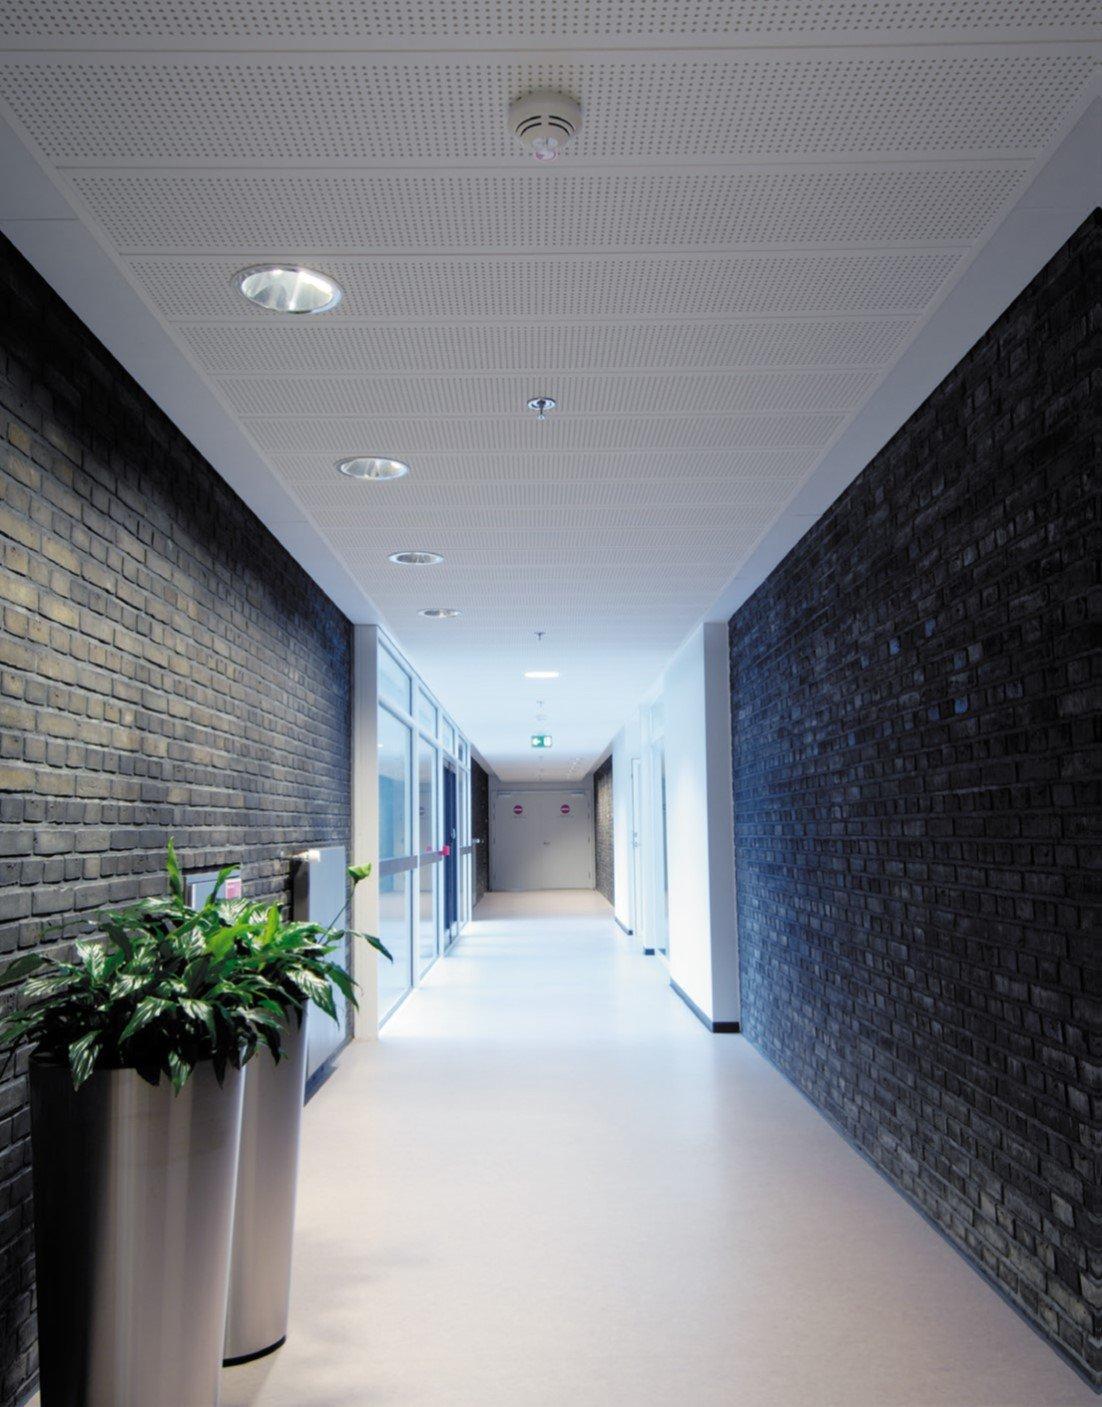 Hôpital privé - Corridor Globe